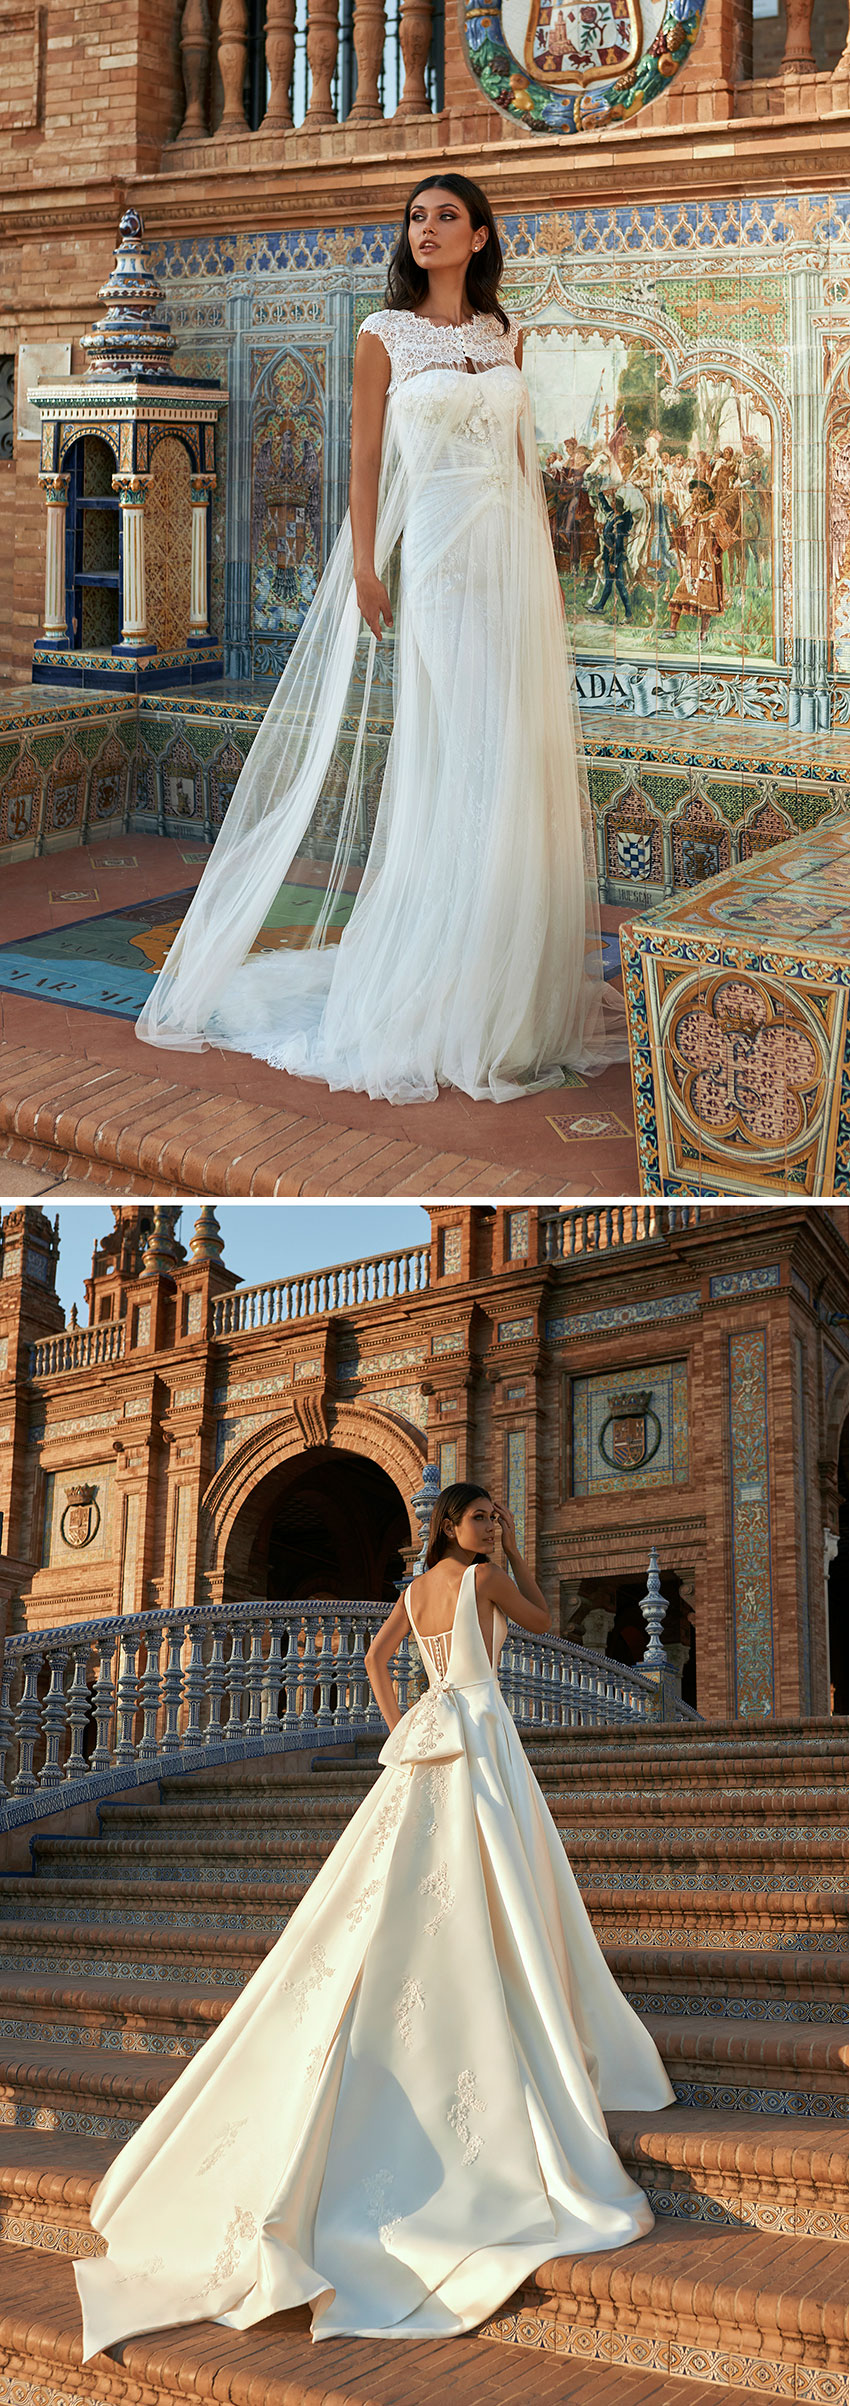 Marchesa for Pronovias combines the romantic hallmark of Marchesa with Mediterranean sensuality Perfect Wedding Magazine